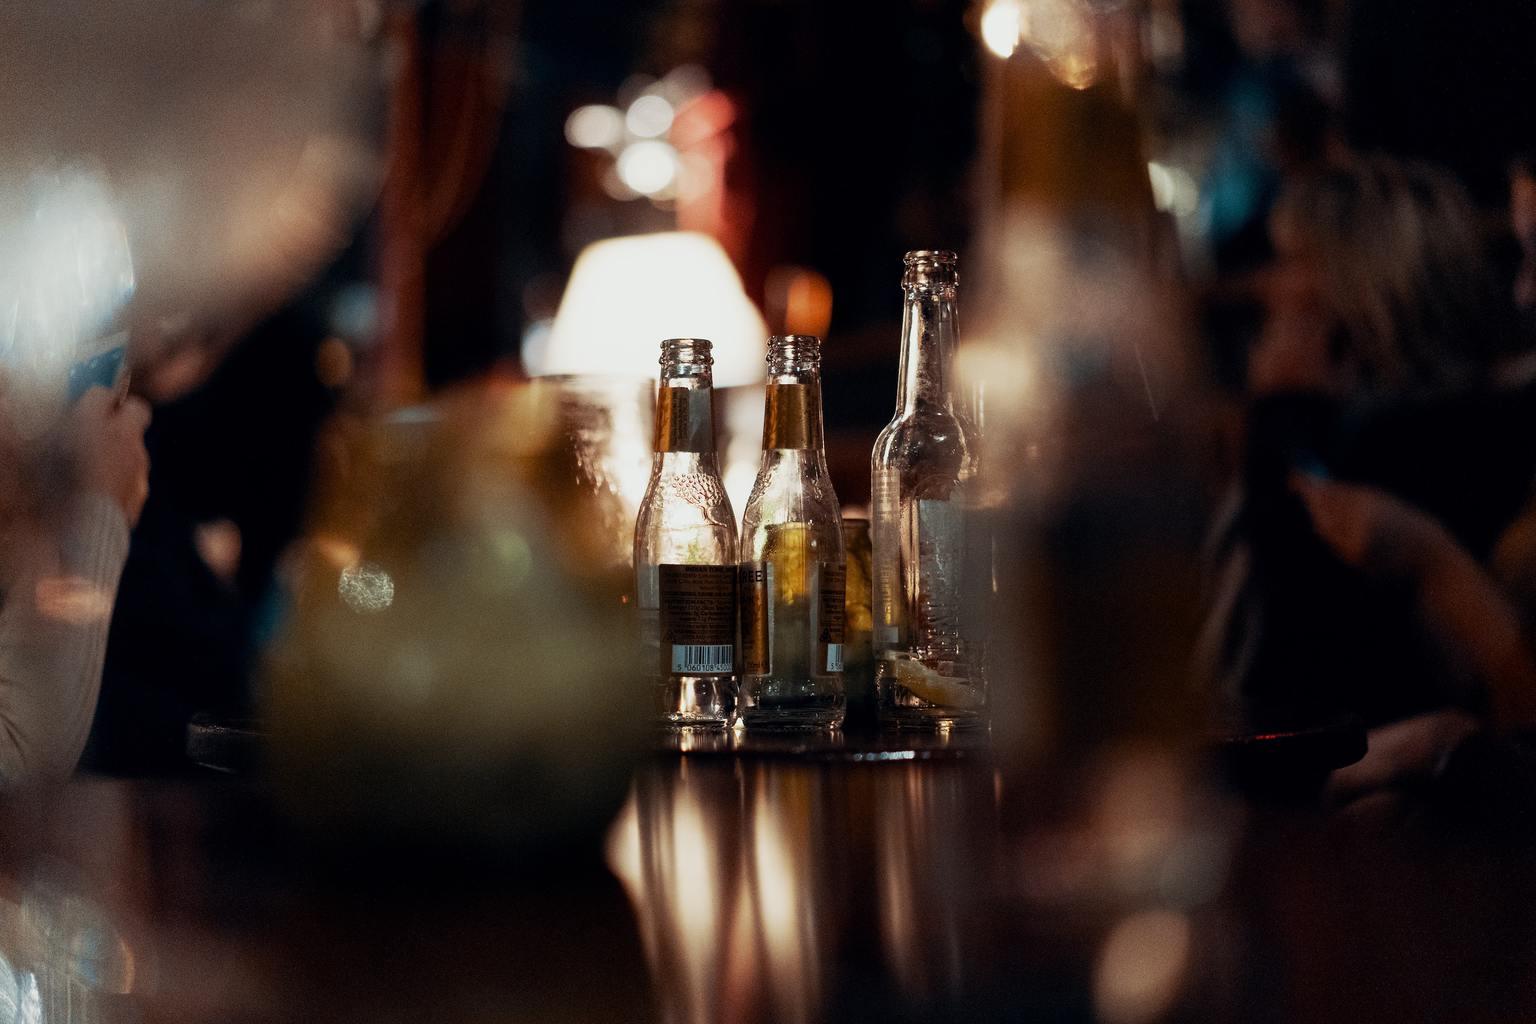 Botellas en fiesta nocturna destacadas con enfoque selectivo